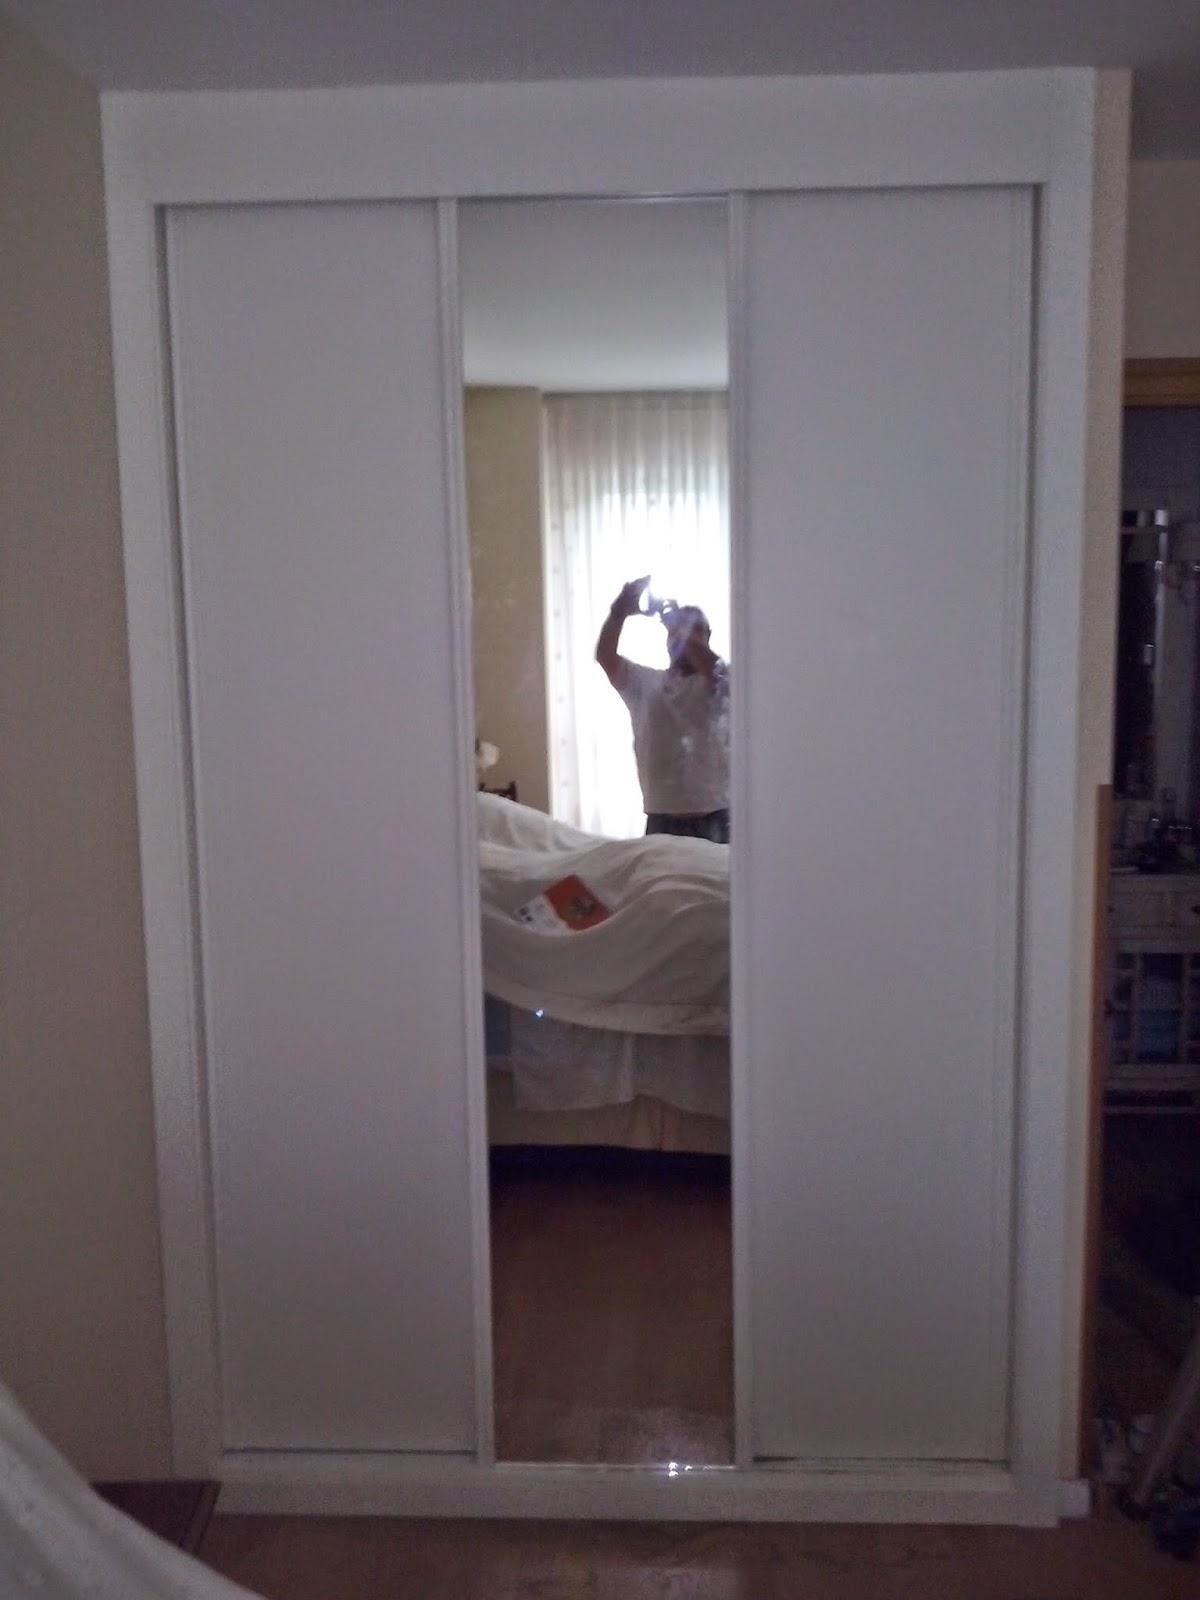 Maderarte siero frentes e interiores de armarios - Interiores armarios empotrados puertas correderas ...